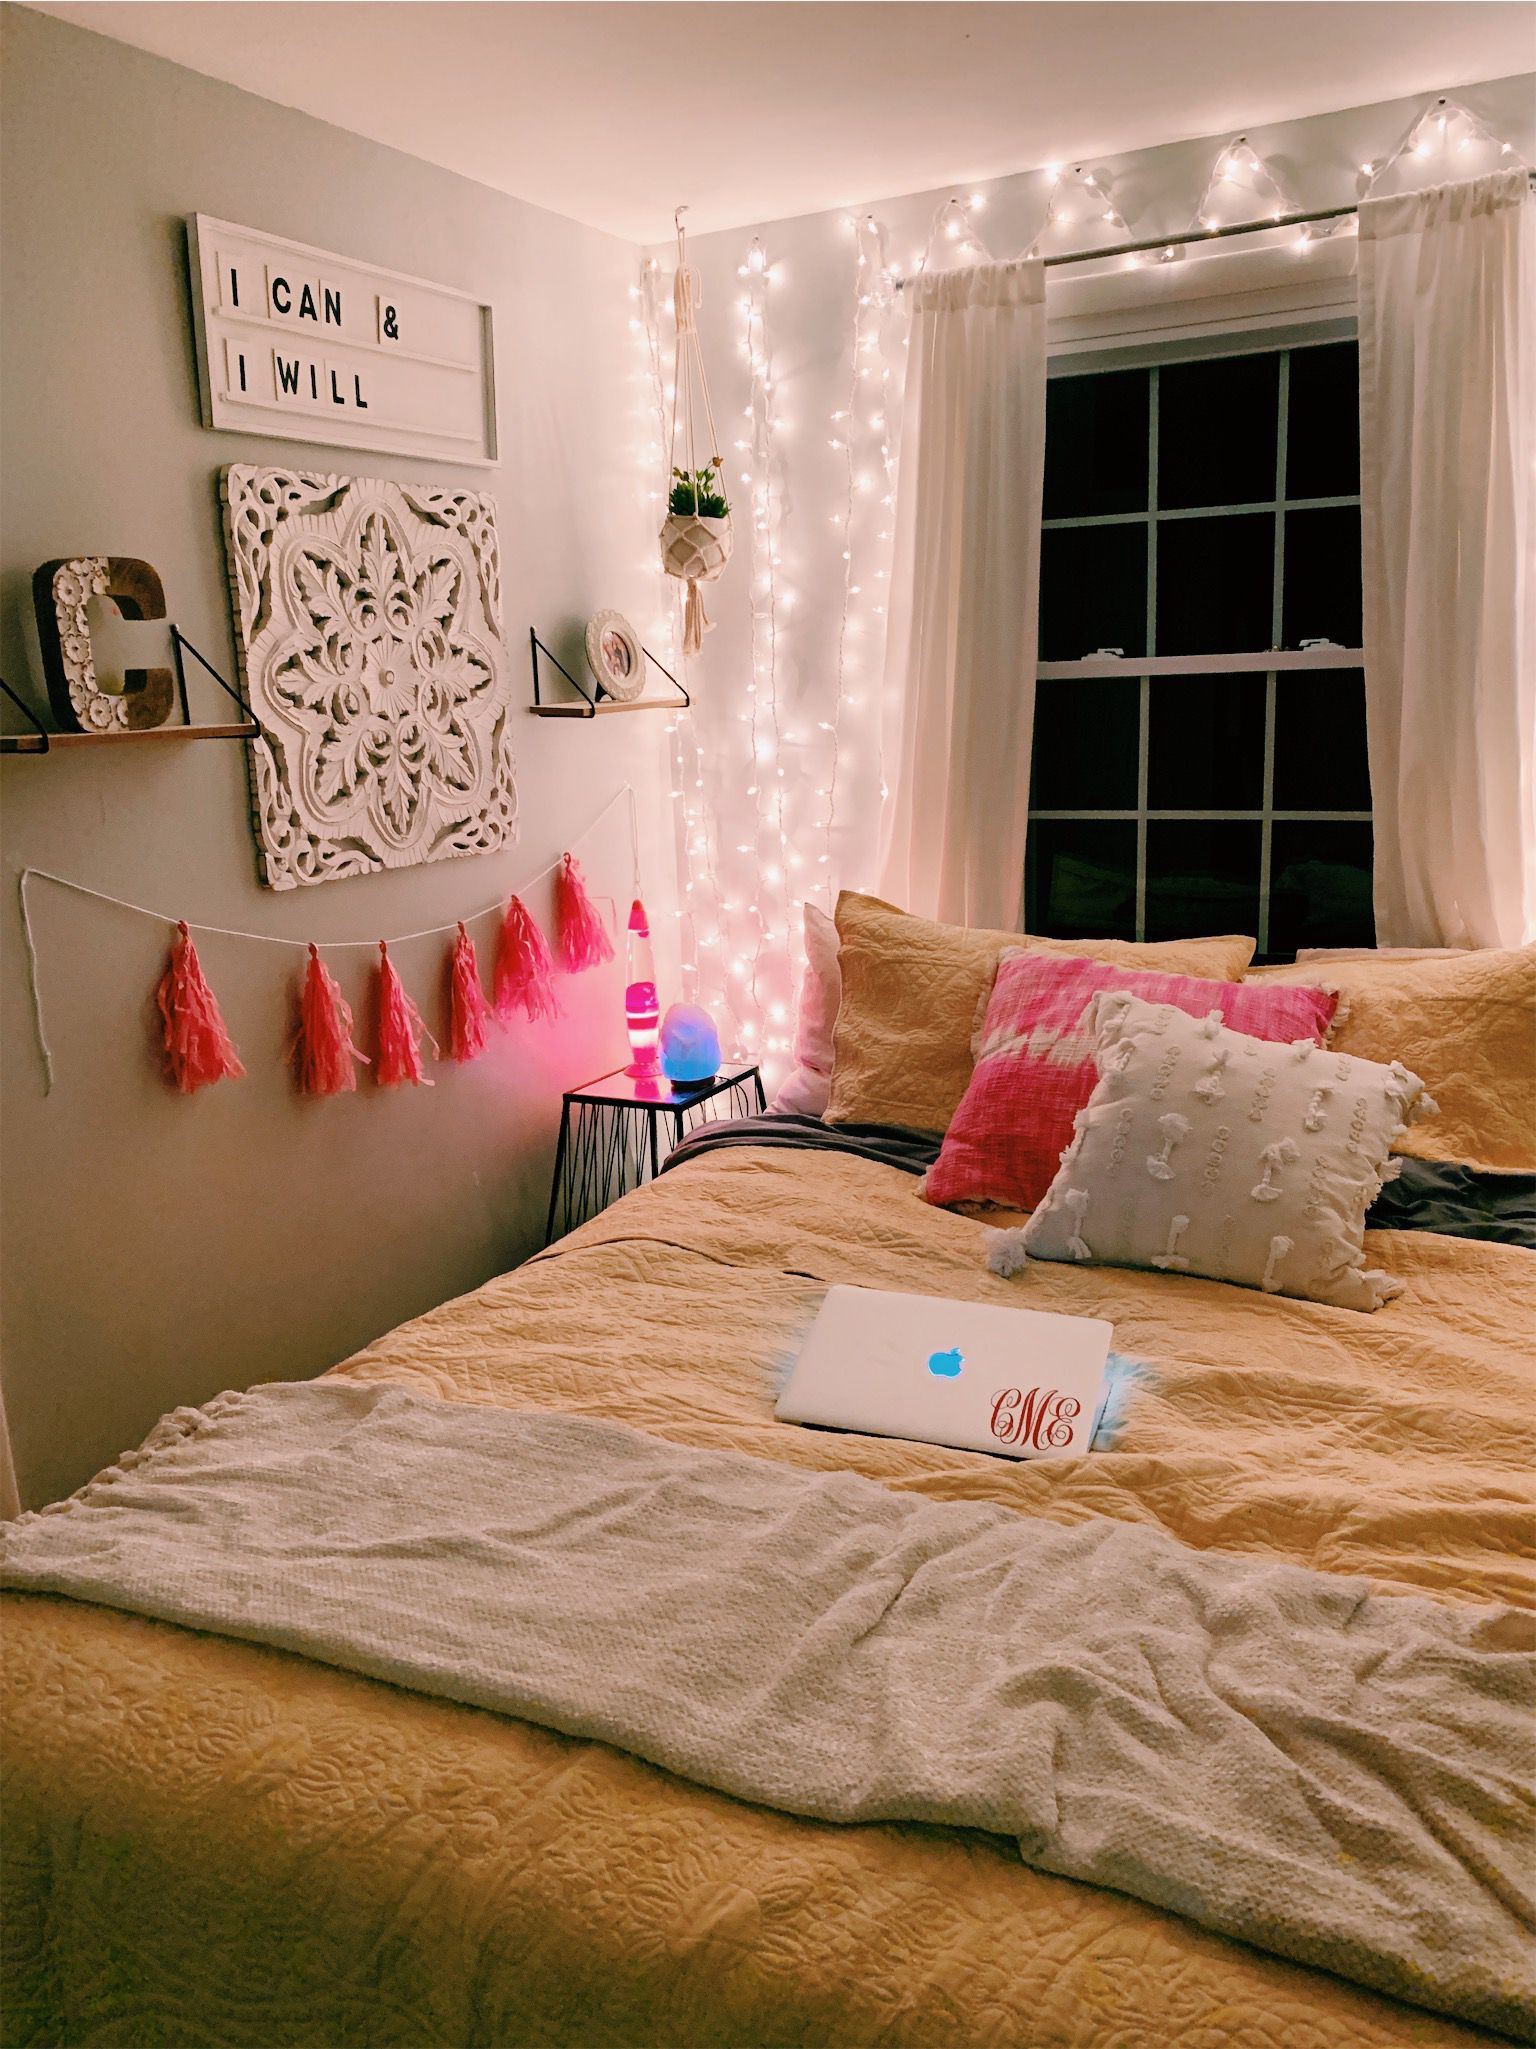 vsco bedroom Room design, Room decor, Stylish bedroom